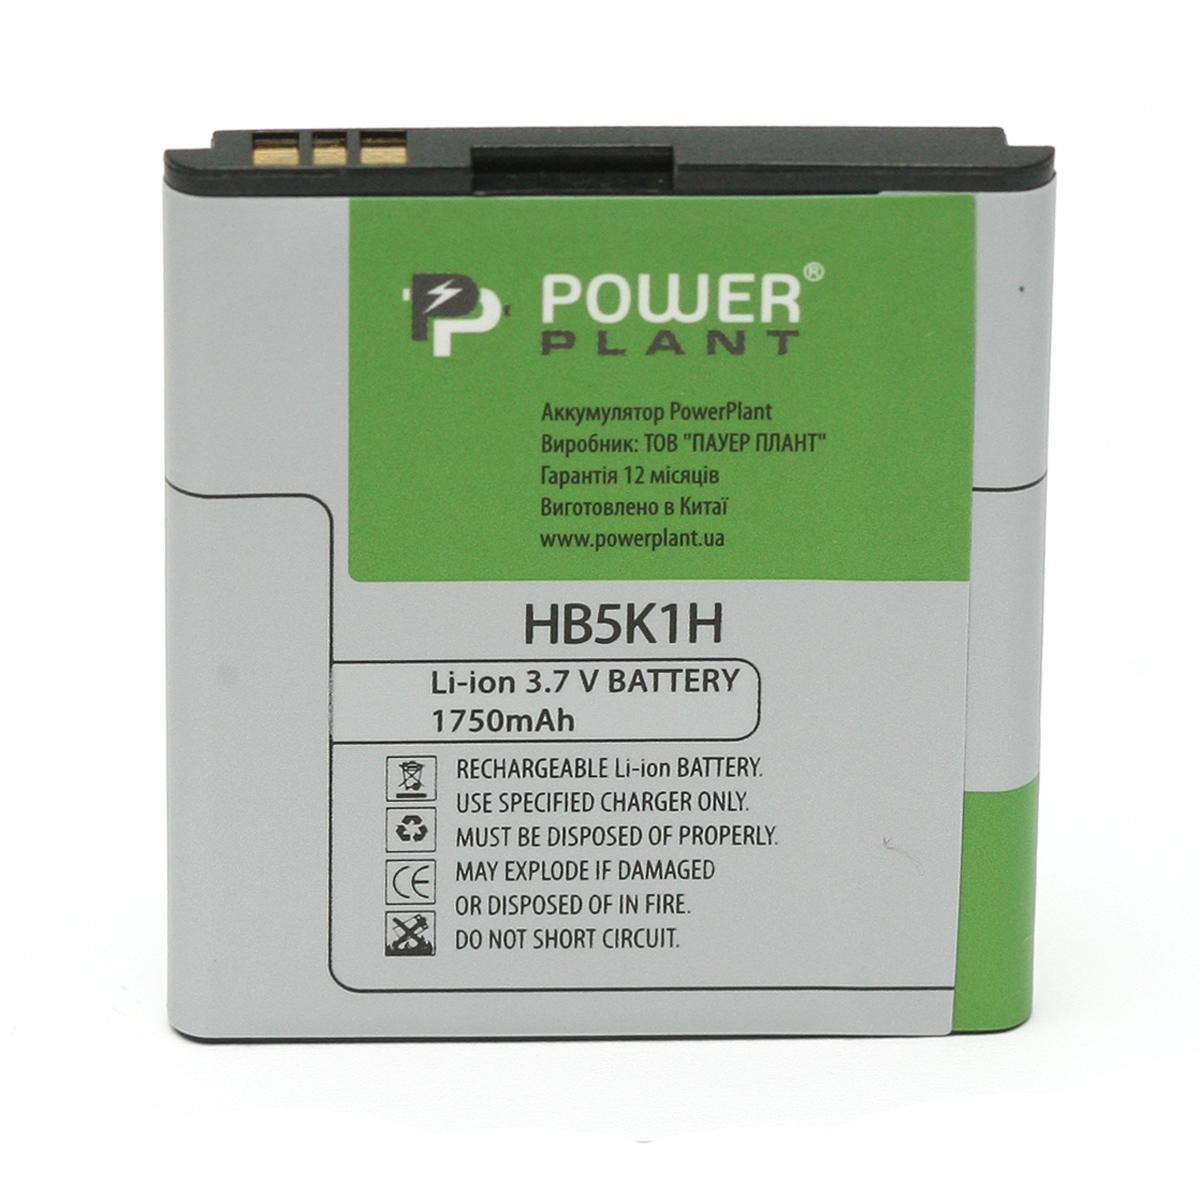 Купить Аккумулятор PowerPlant Huawei U8650 (HB5K1H) 1750mAh